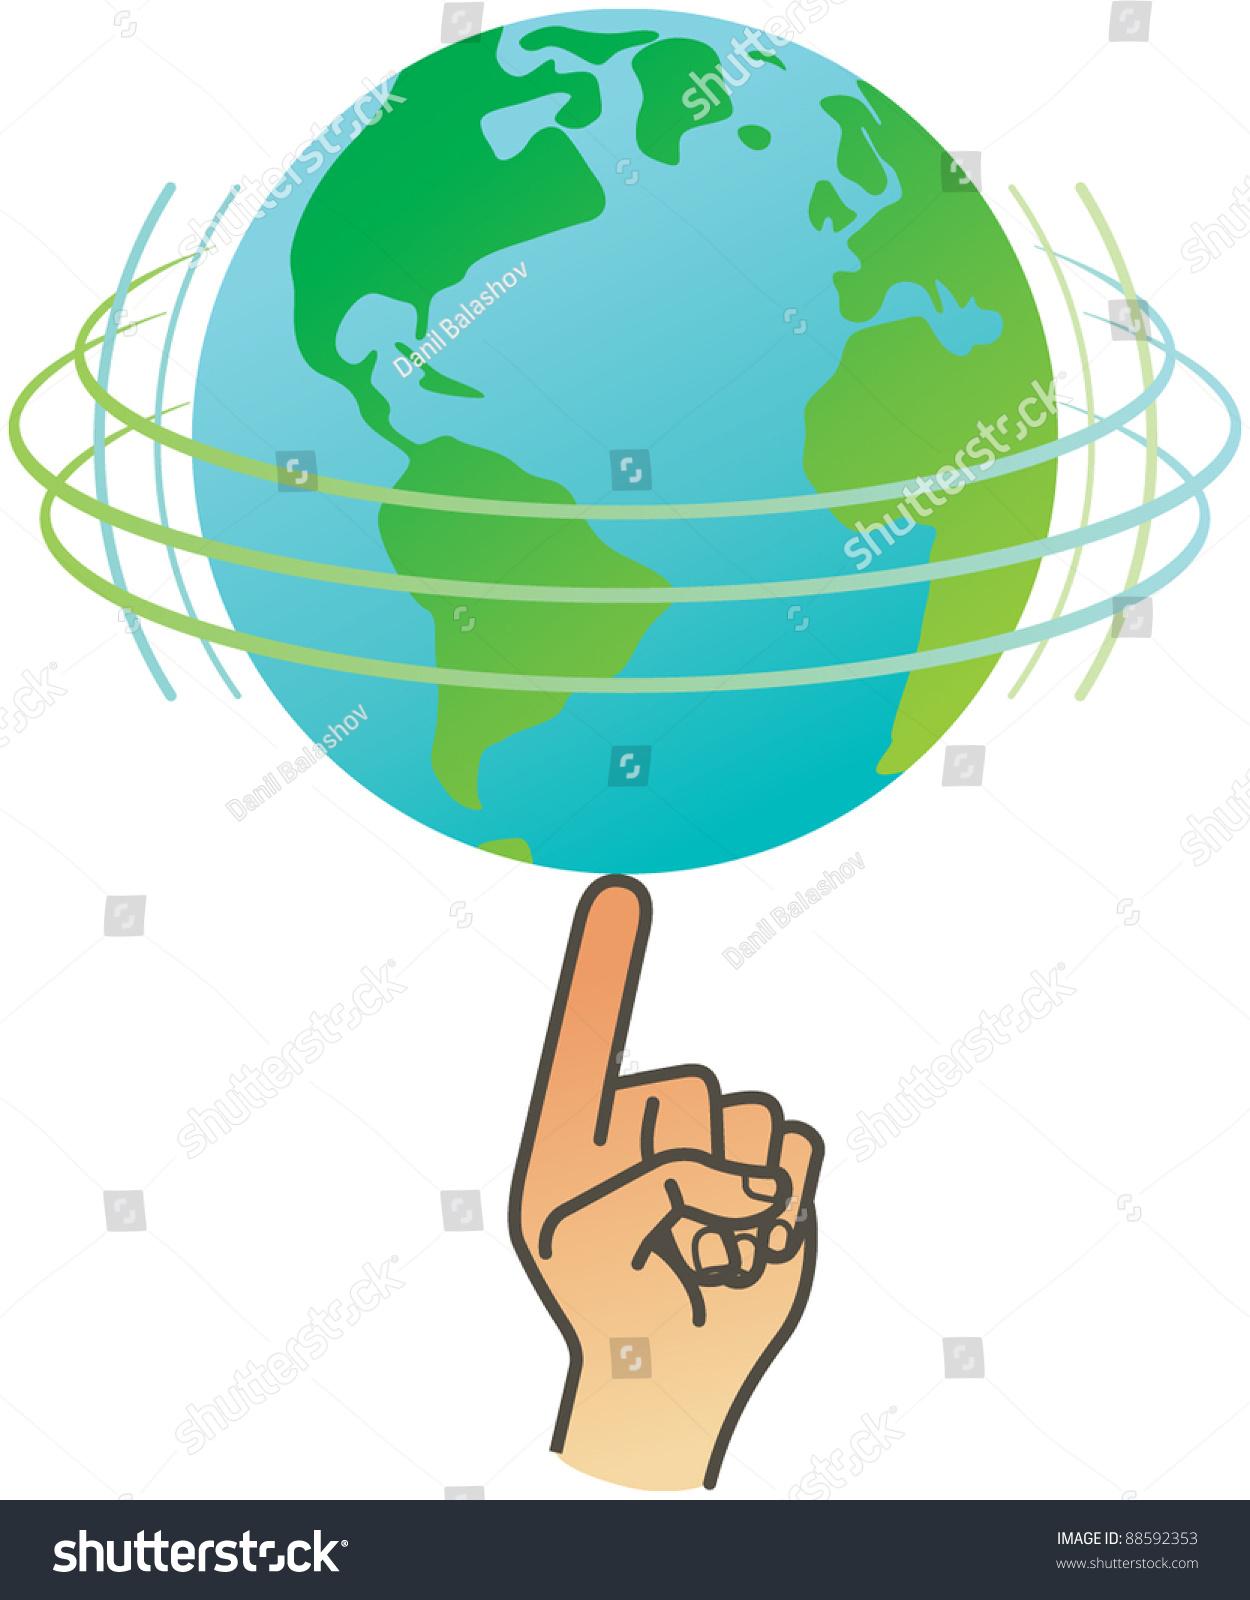 spinning globe clip art animation - photo #43